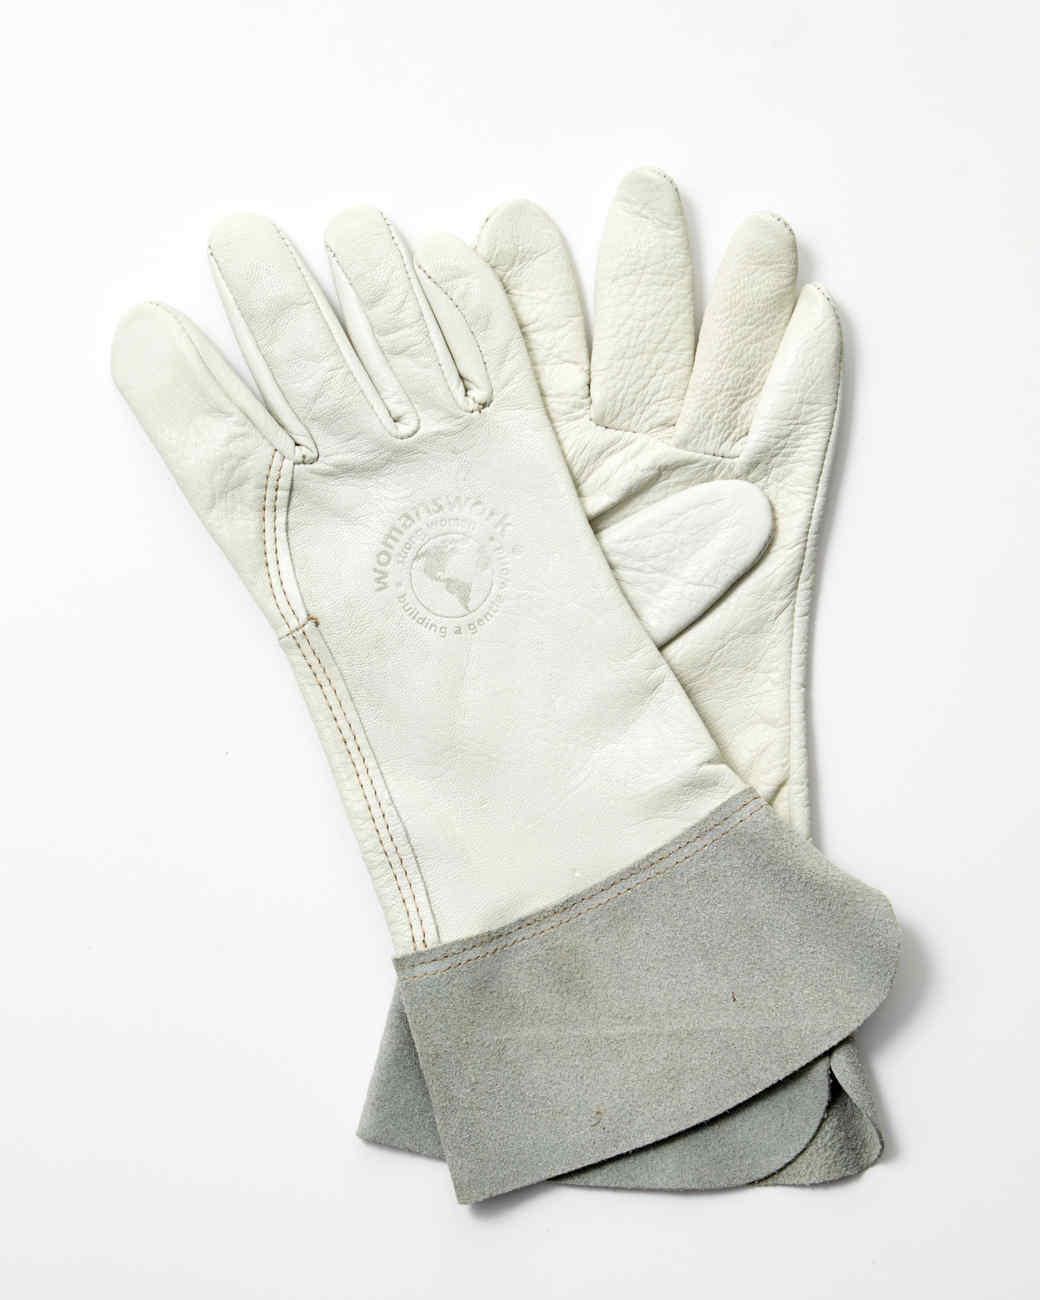 garden-gloves-2976-d112789-0116.jpg